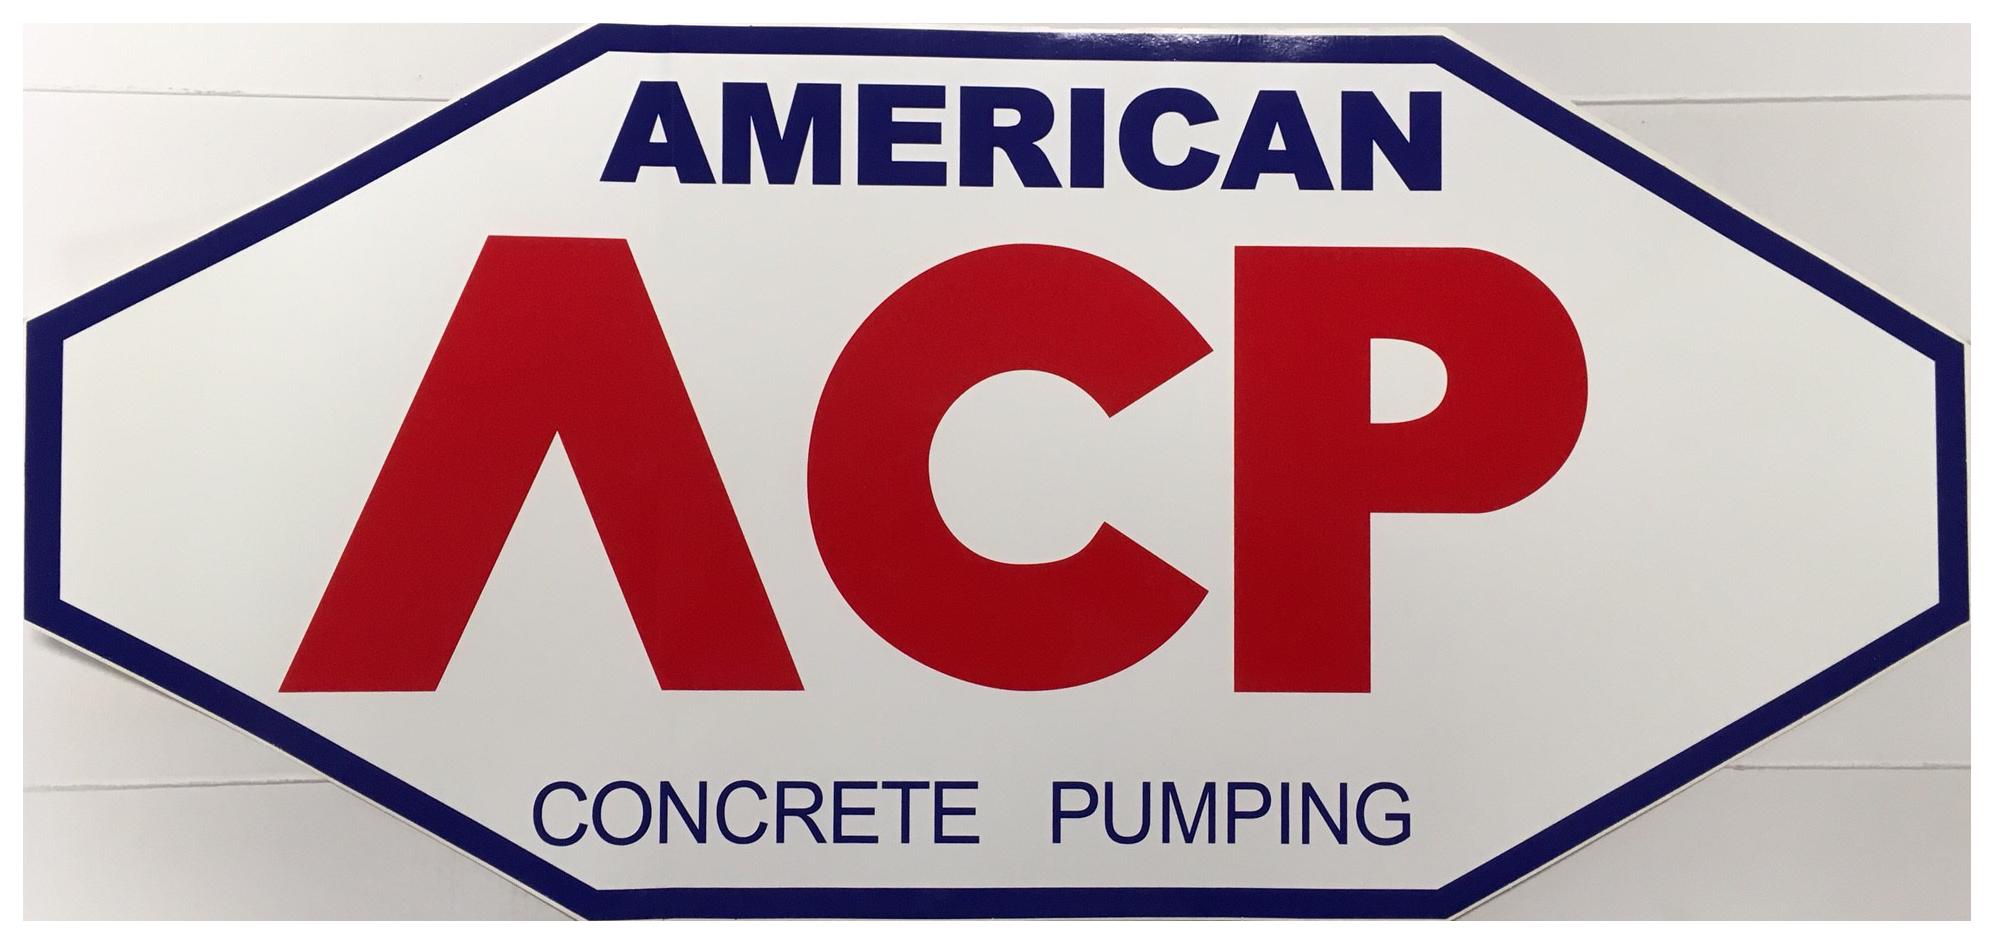 American Concrete Pumping, LLC's logo